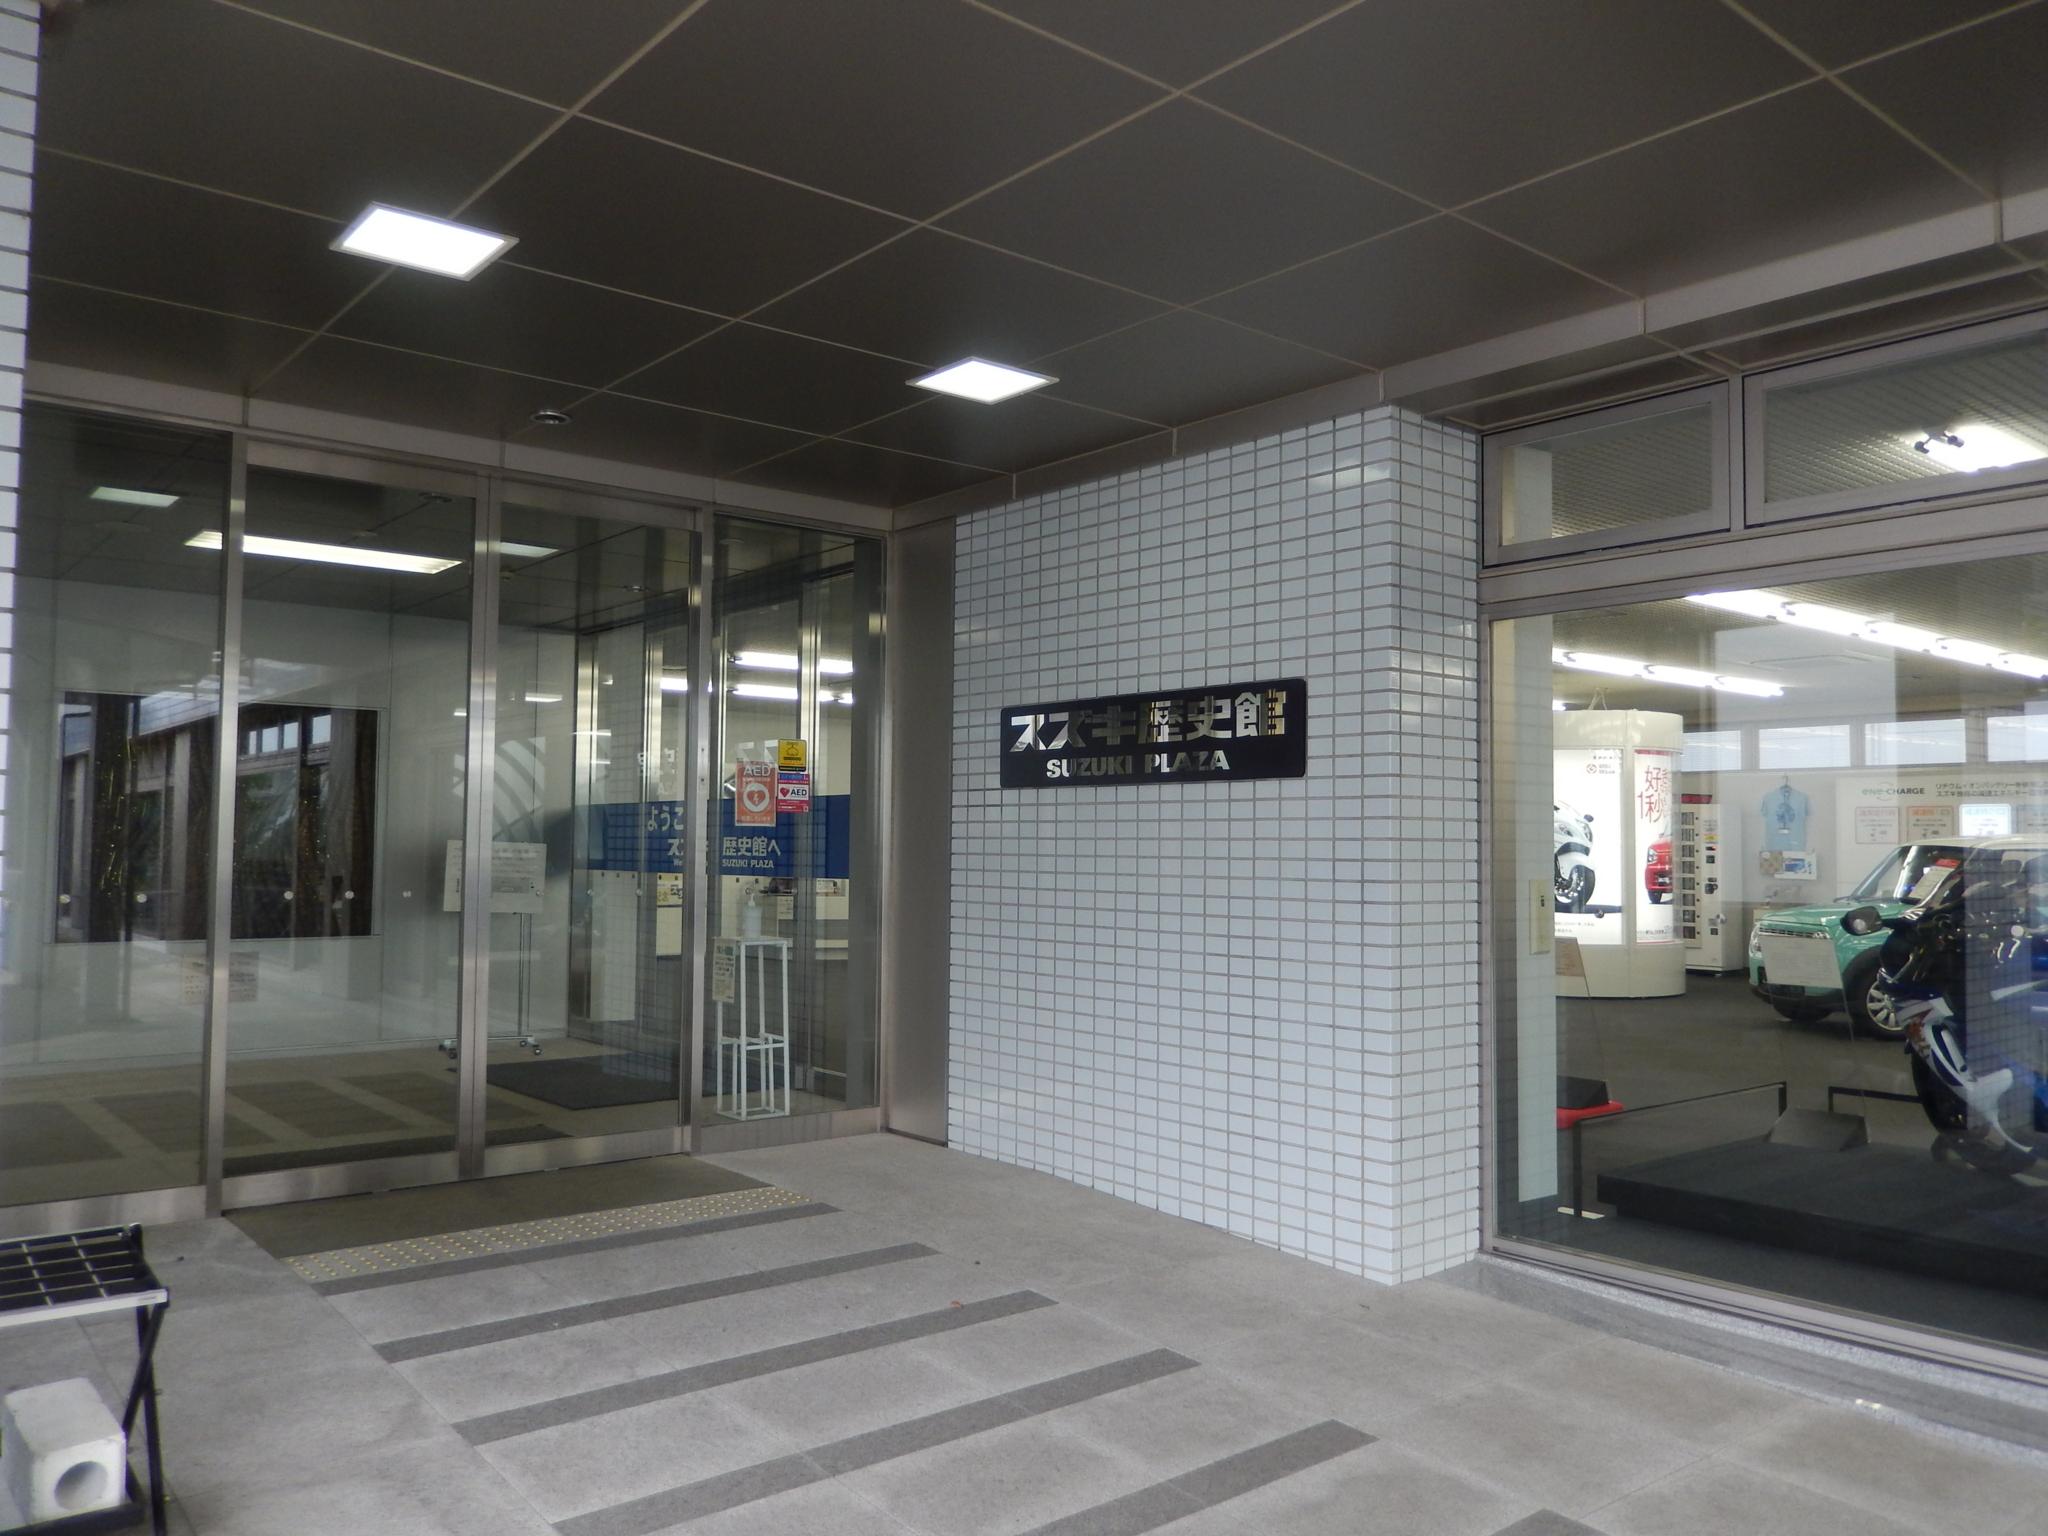 f:id:ToshUeno:20150619161016j:plain